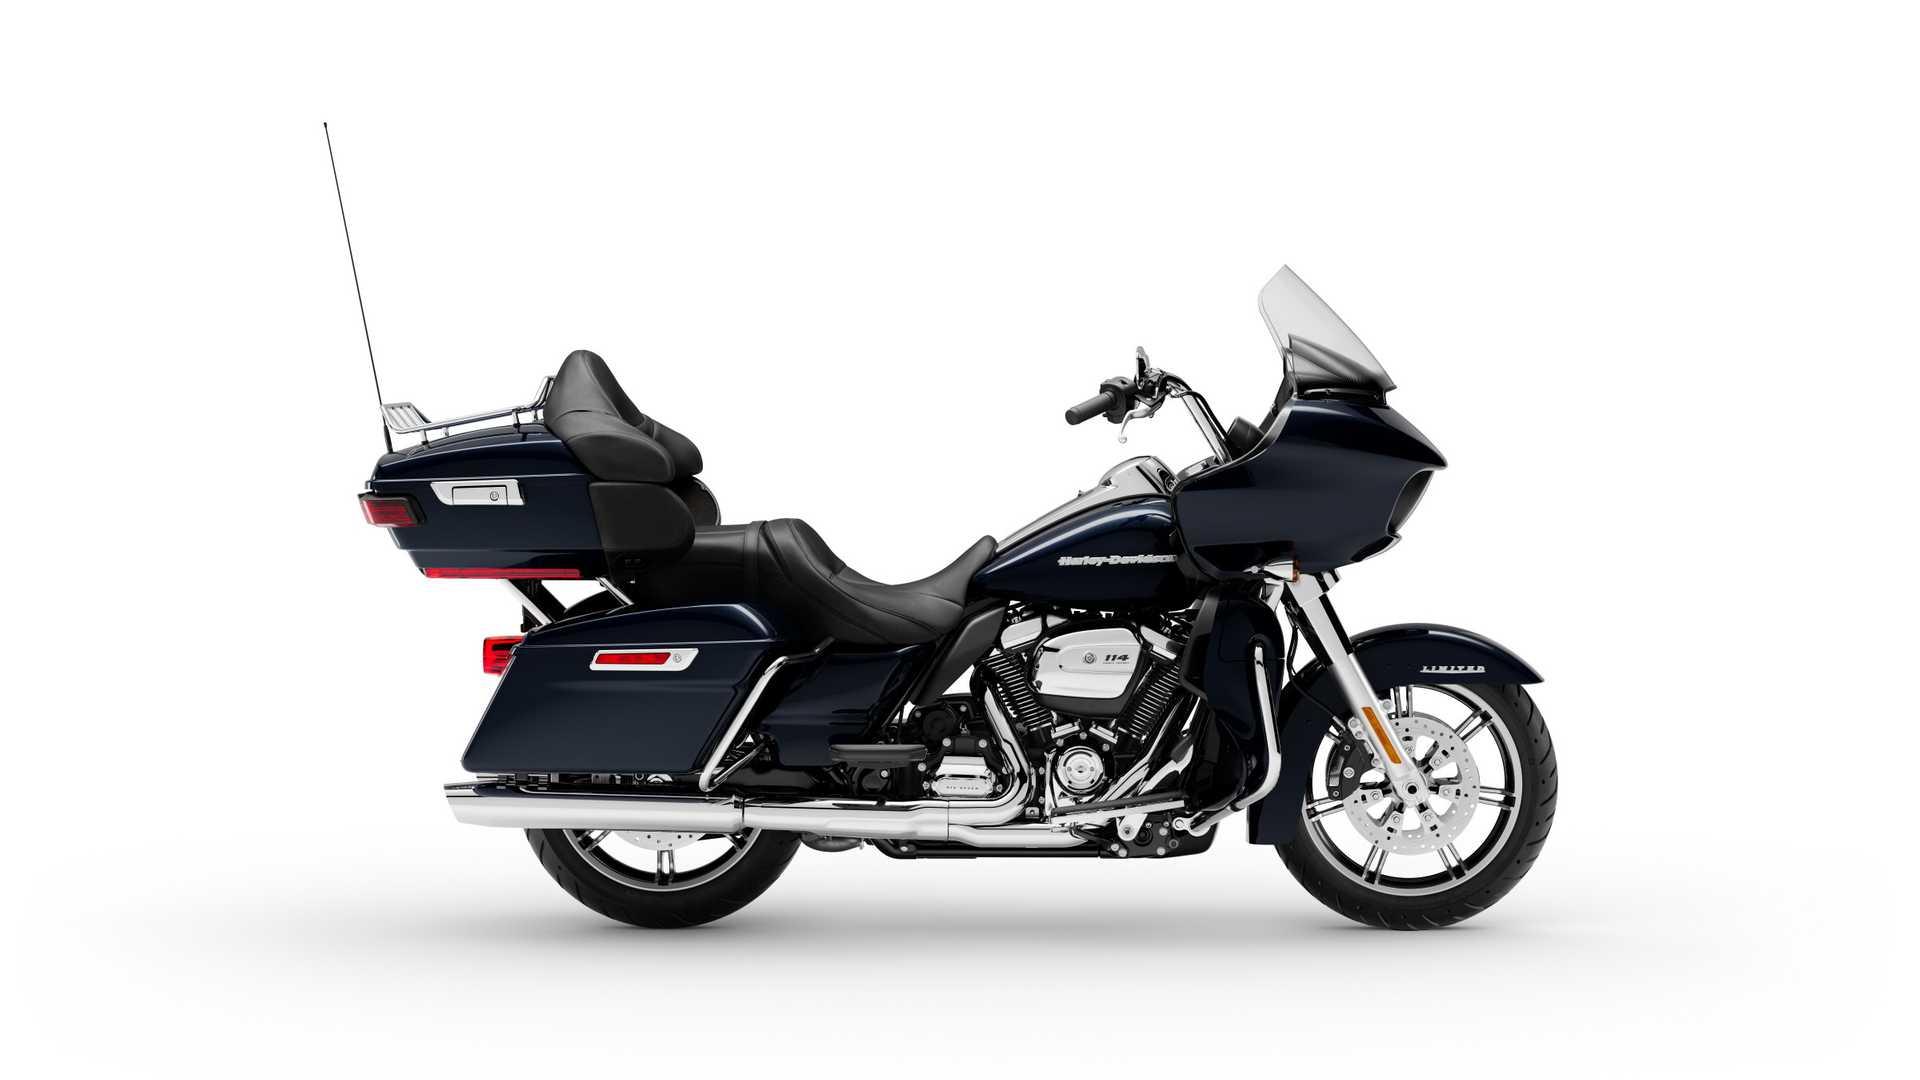 2020 Harley-Davidson Models Revealed - BikesRepublic